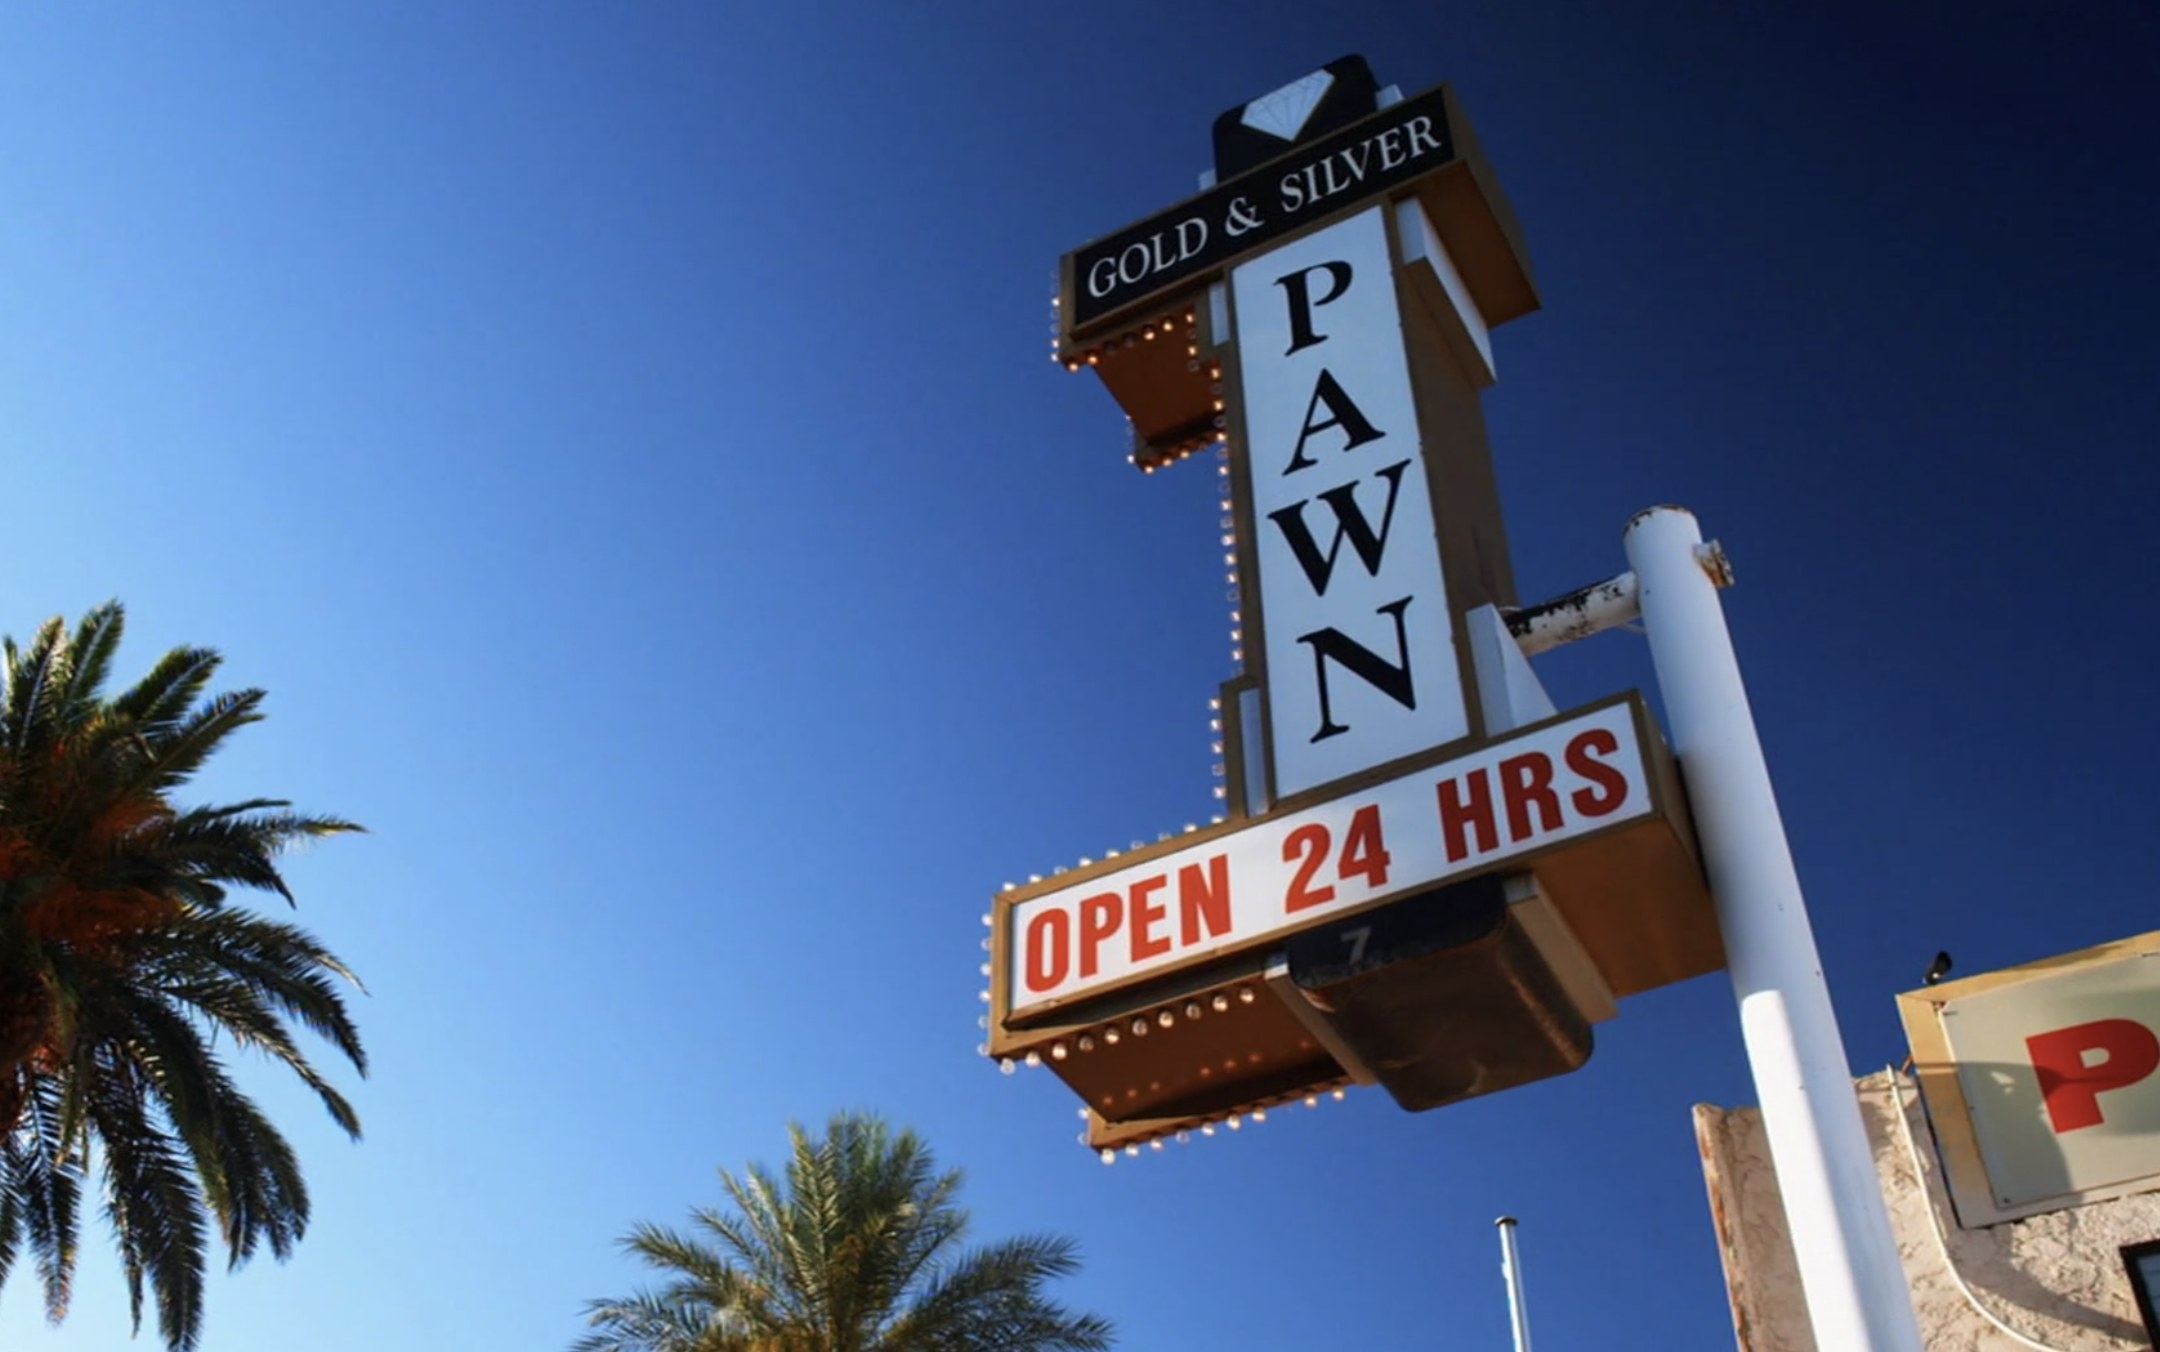 Pawn Stars retail location